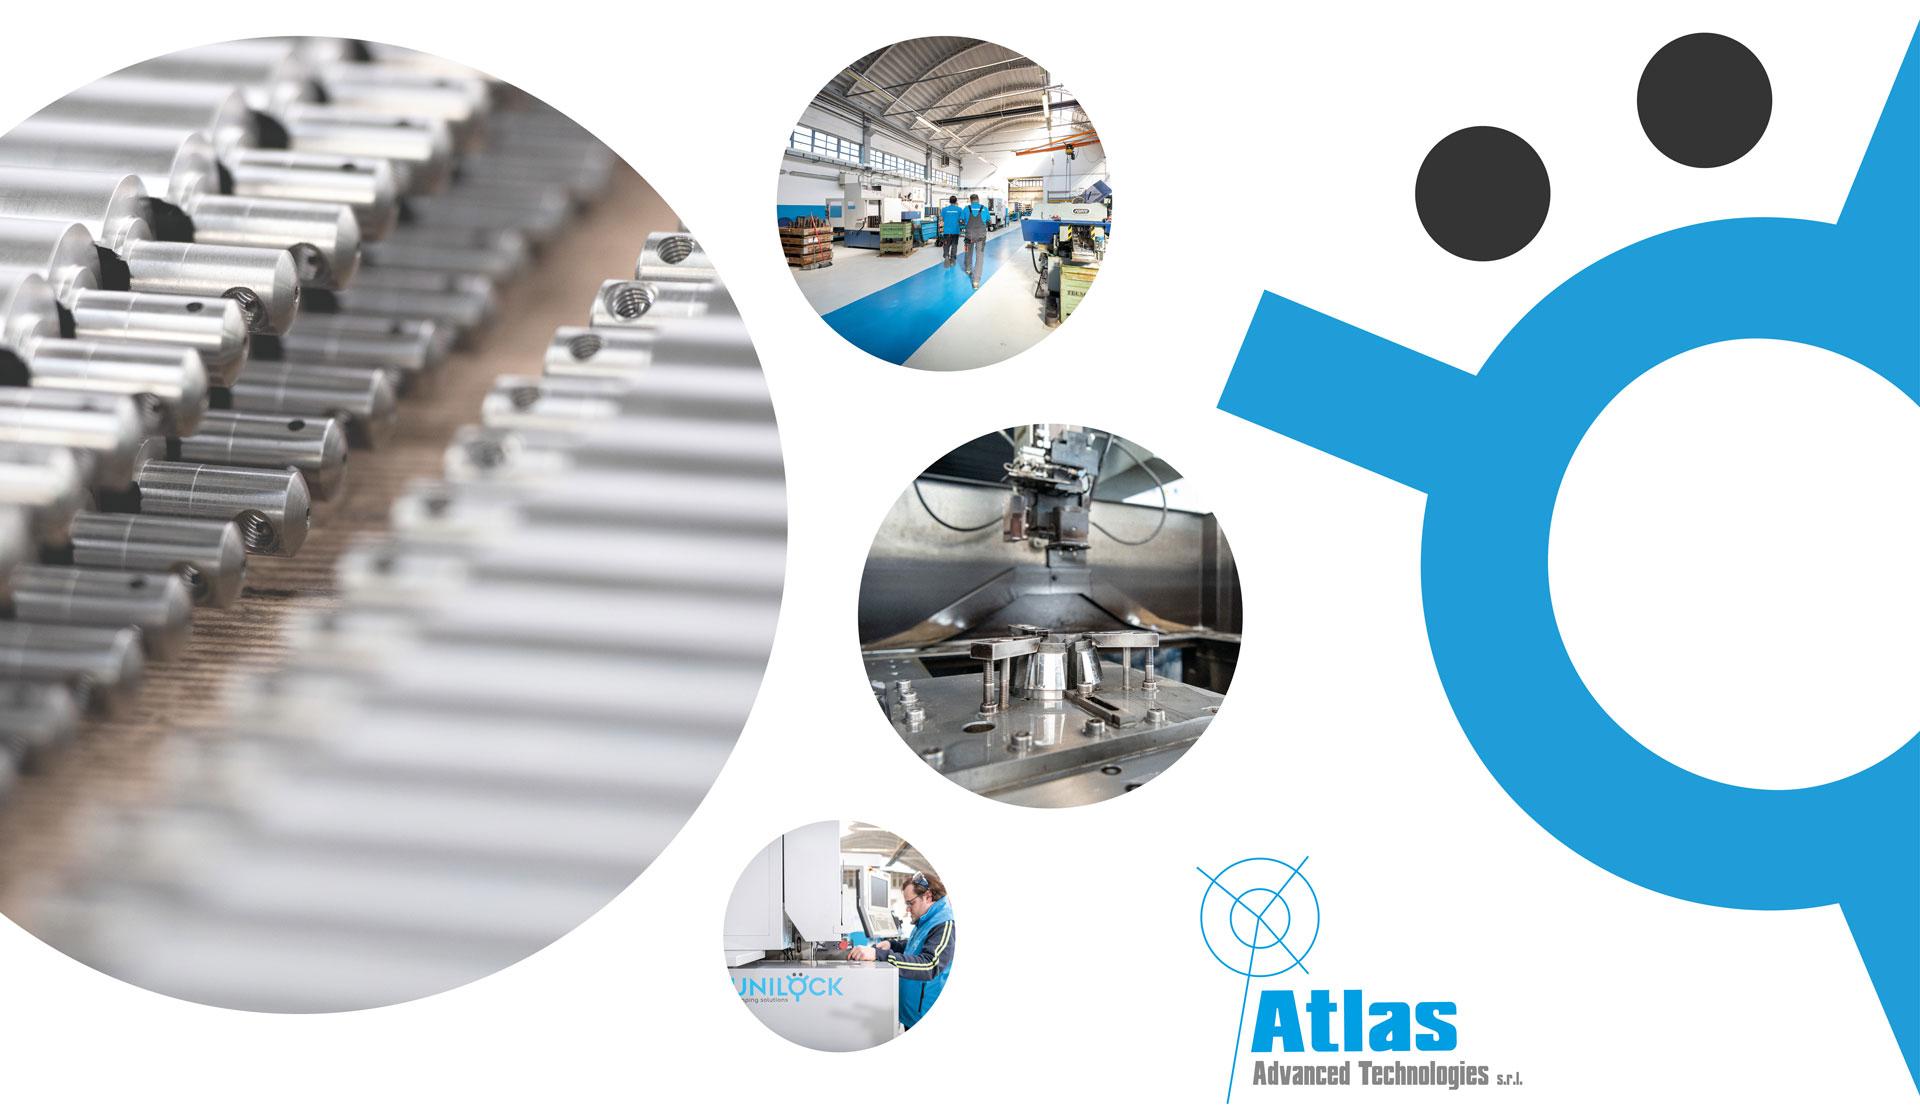 Atlas Advanced Technologies Srl